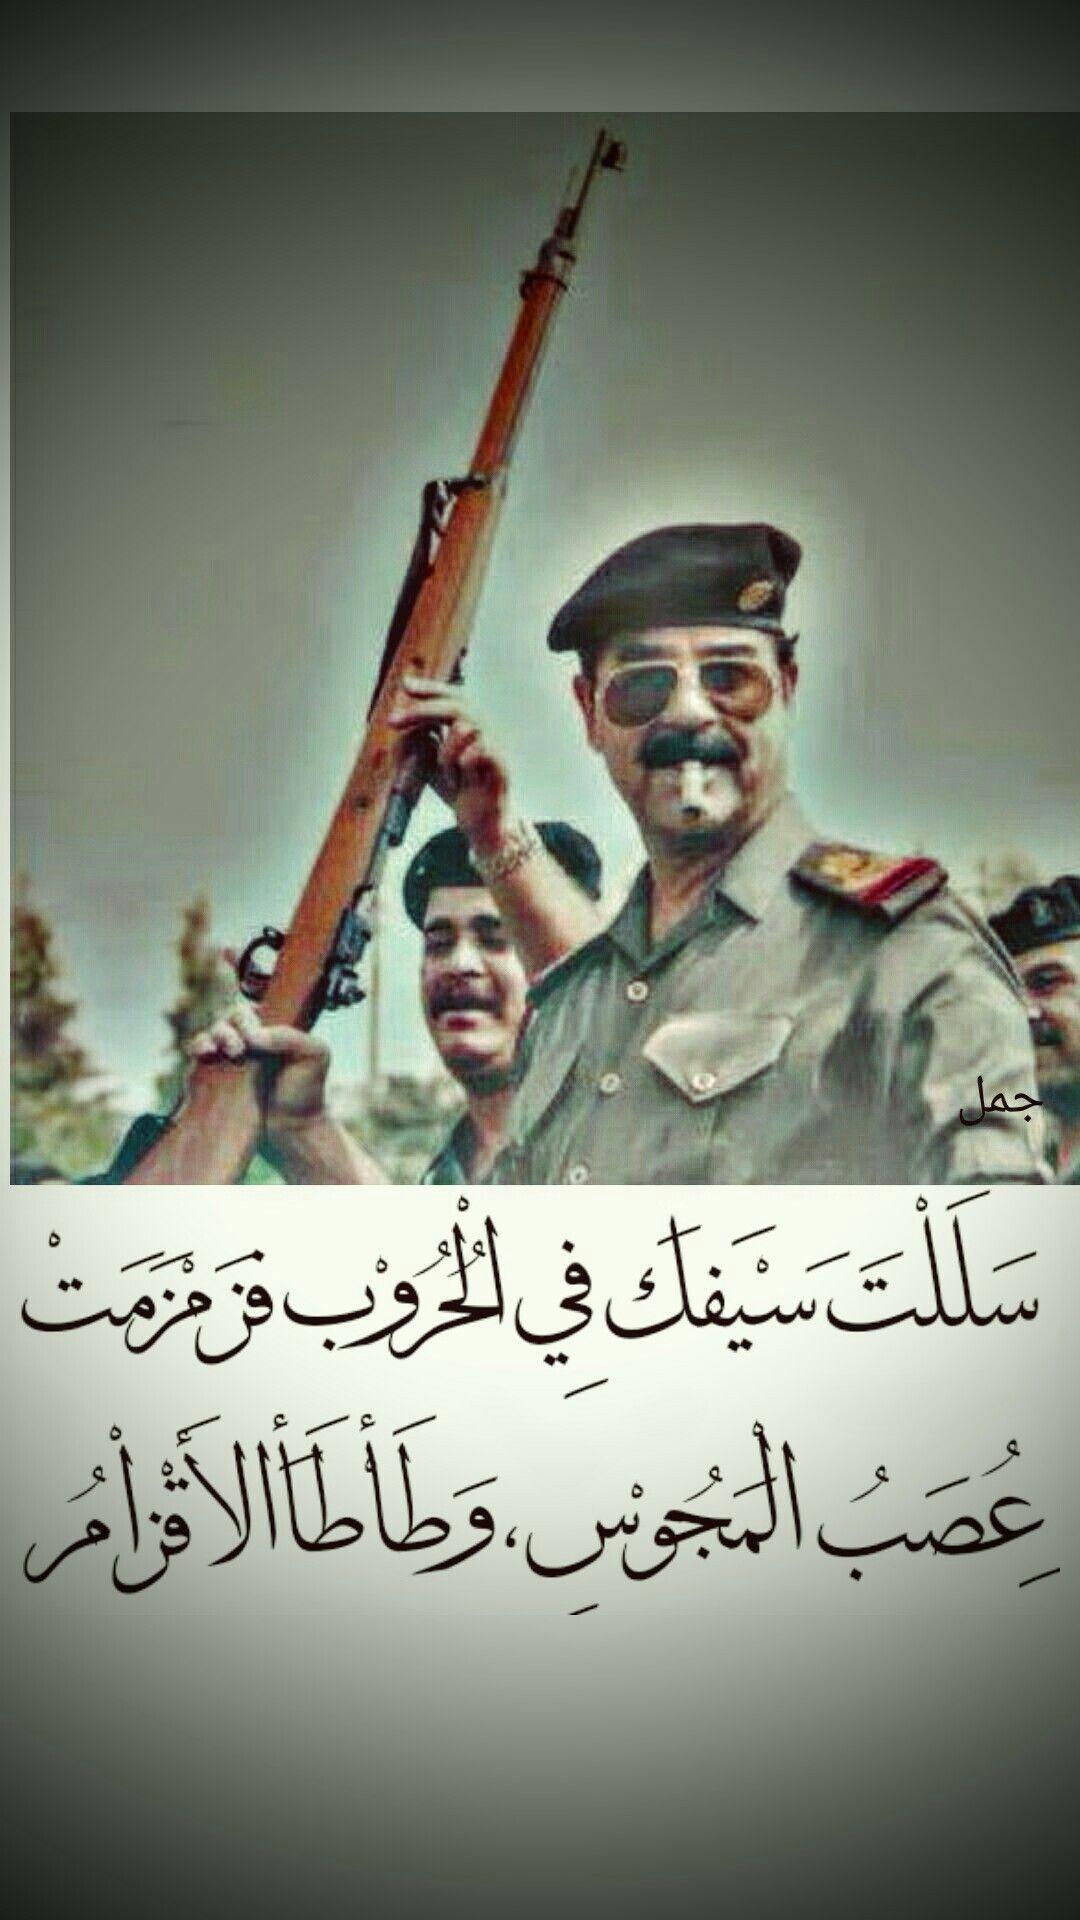 رحم الله قاهر المجوس Funny Caricatures Iraqi President Saddam Hussein